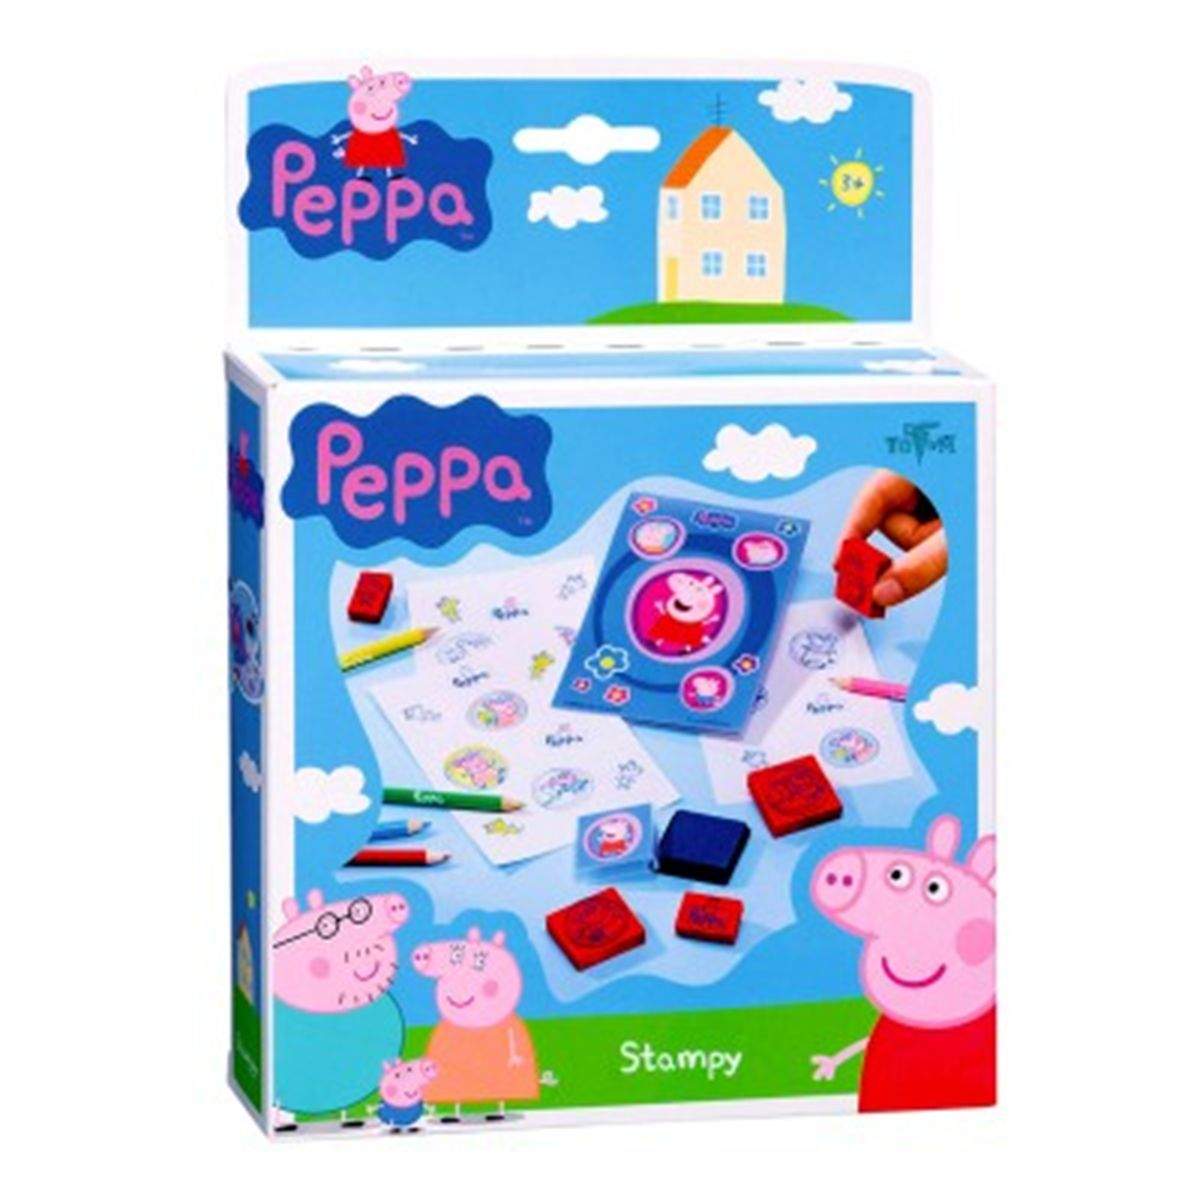 Kit Créatif Peppa Pig Jeu De Tampons Dessins Et Peinture